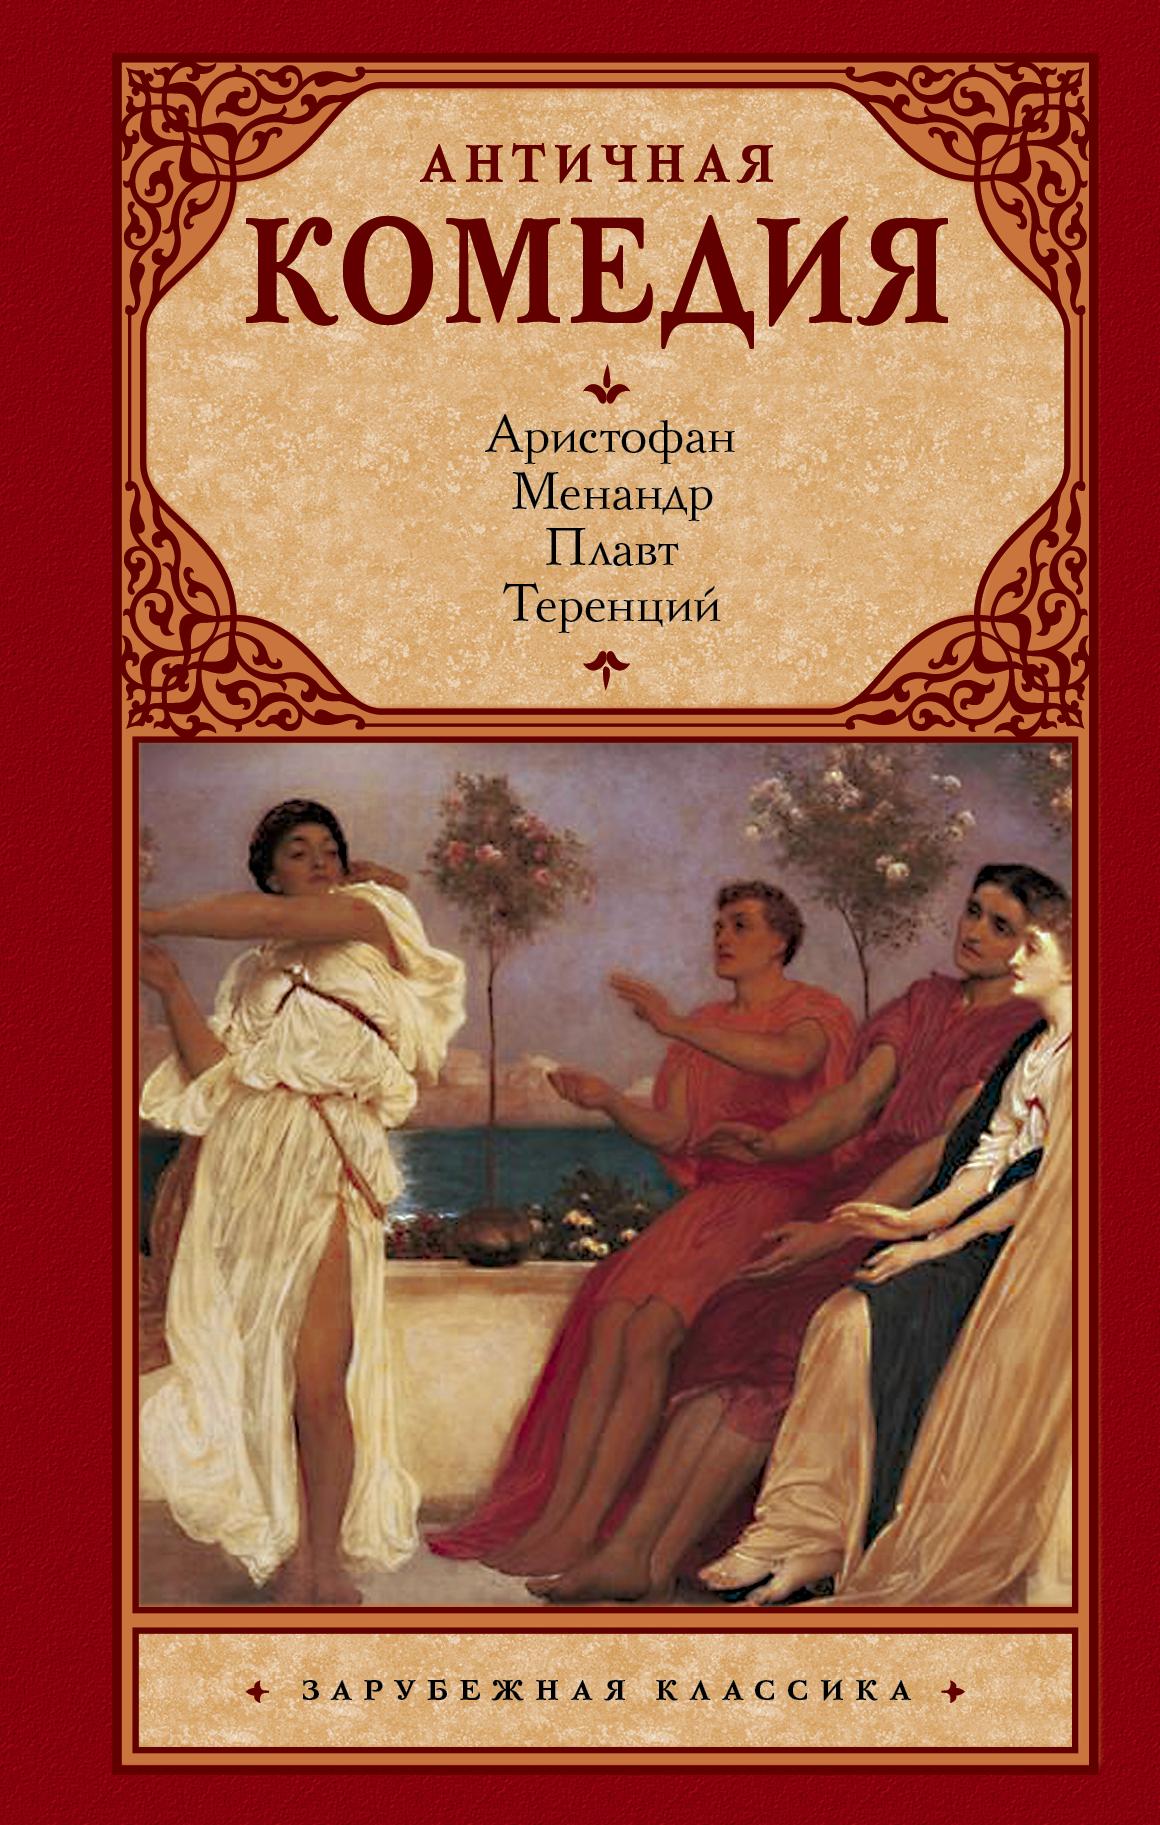 Аристофан, Менандр, Плавт, Теренций Античная комедия лисистрата